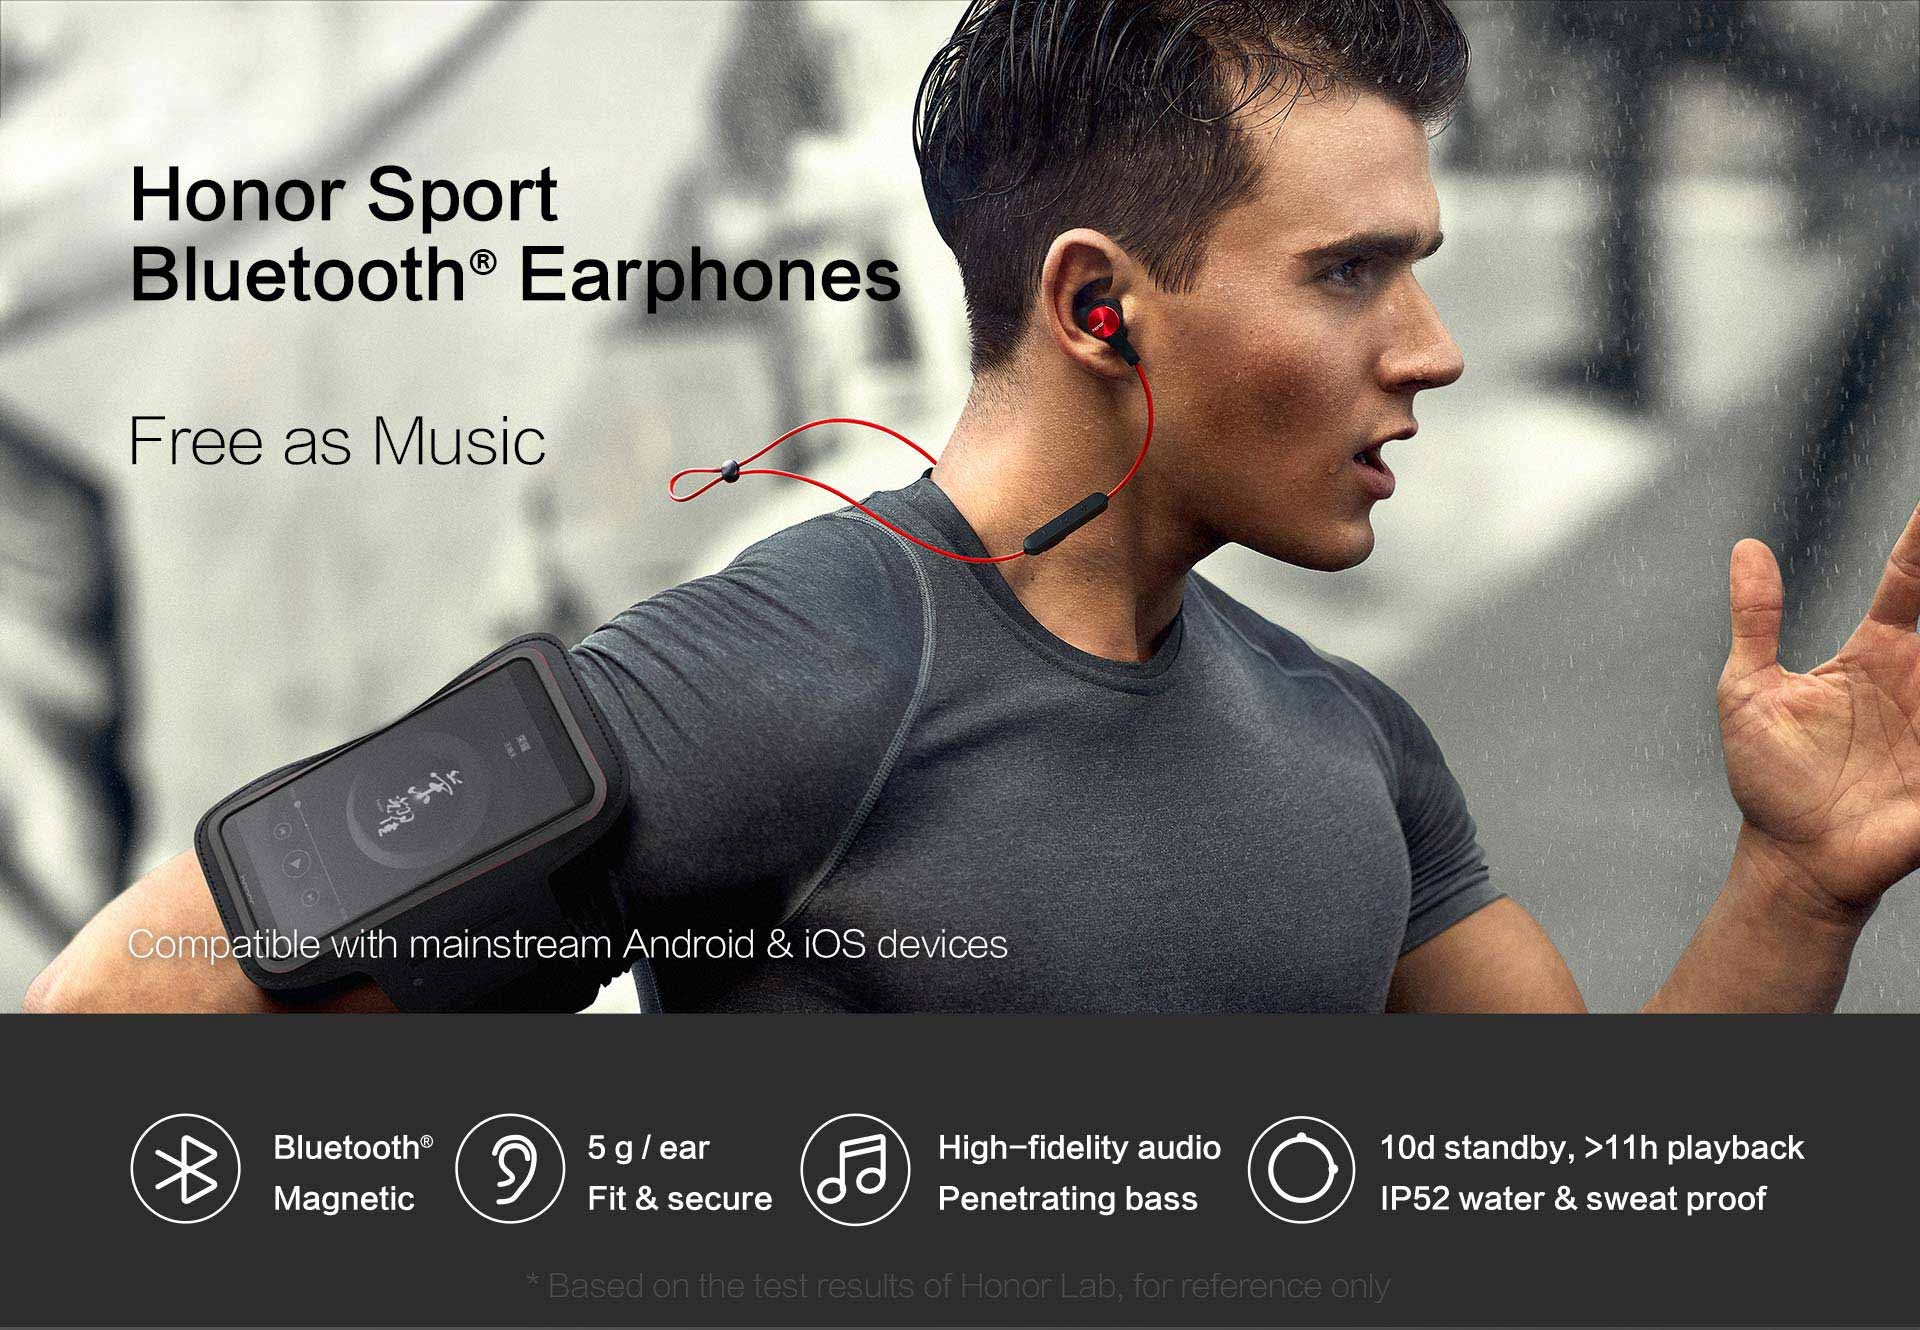 HUAWEI Honor AM61 Sports Earphones Bluetooth